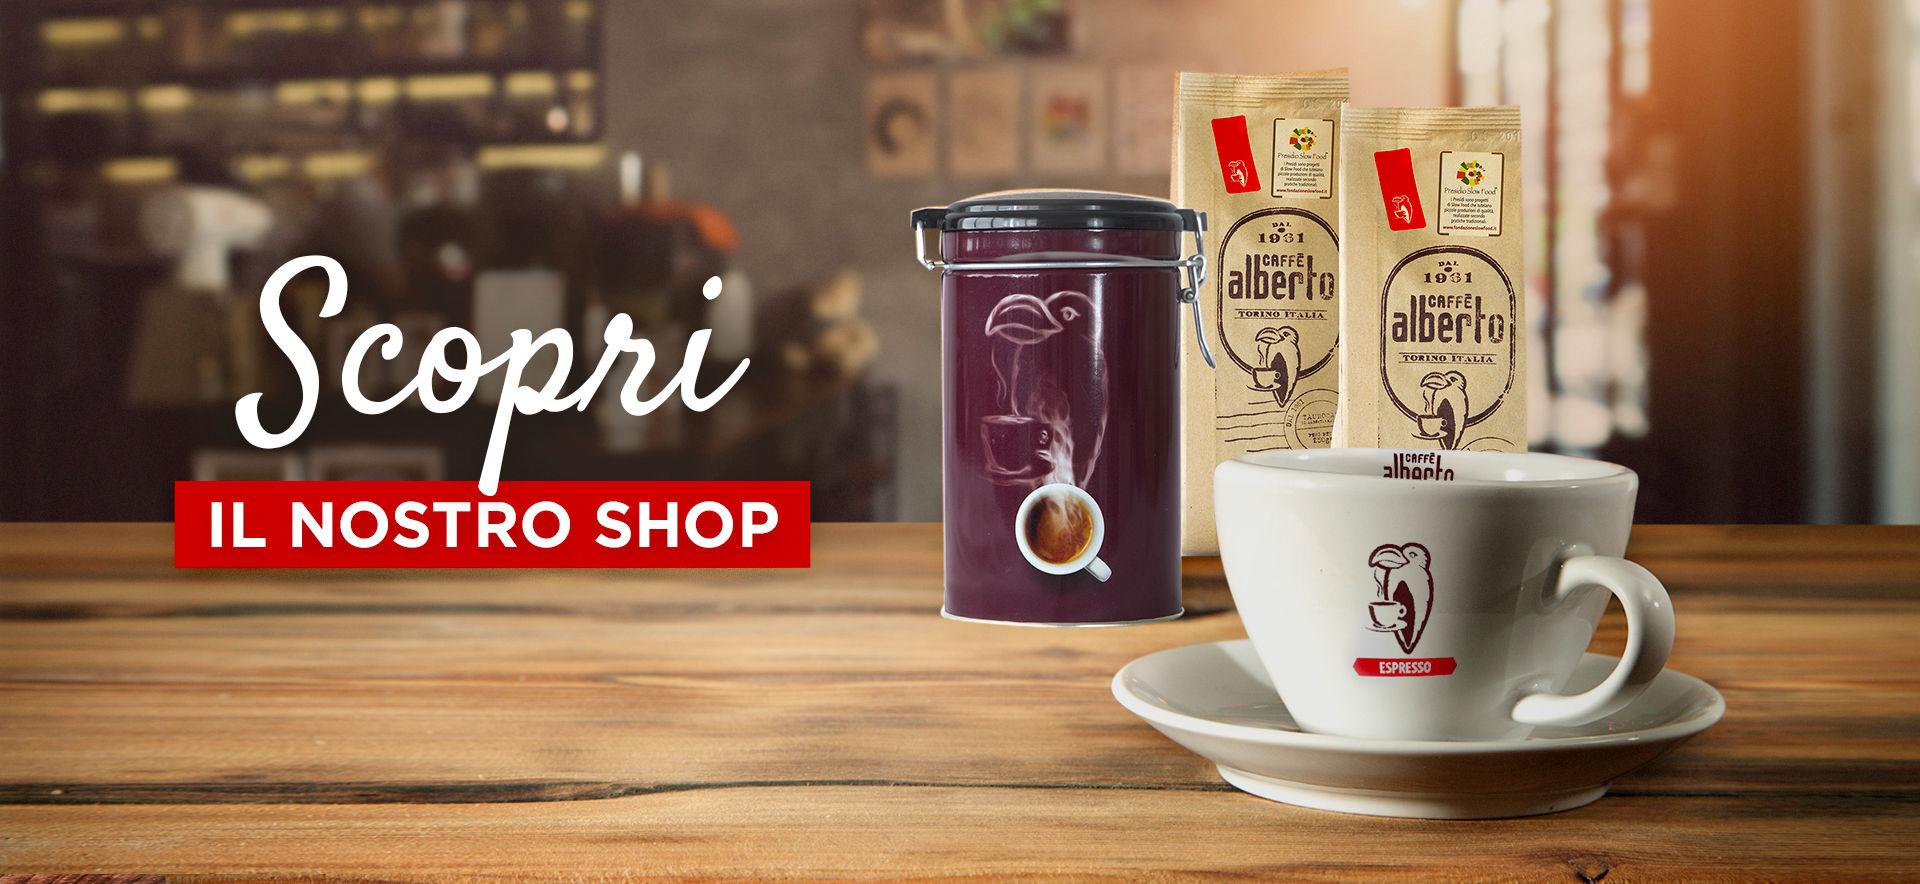 Caffè Alberto